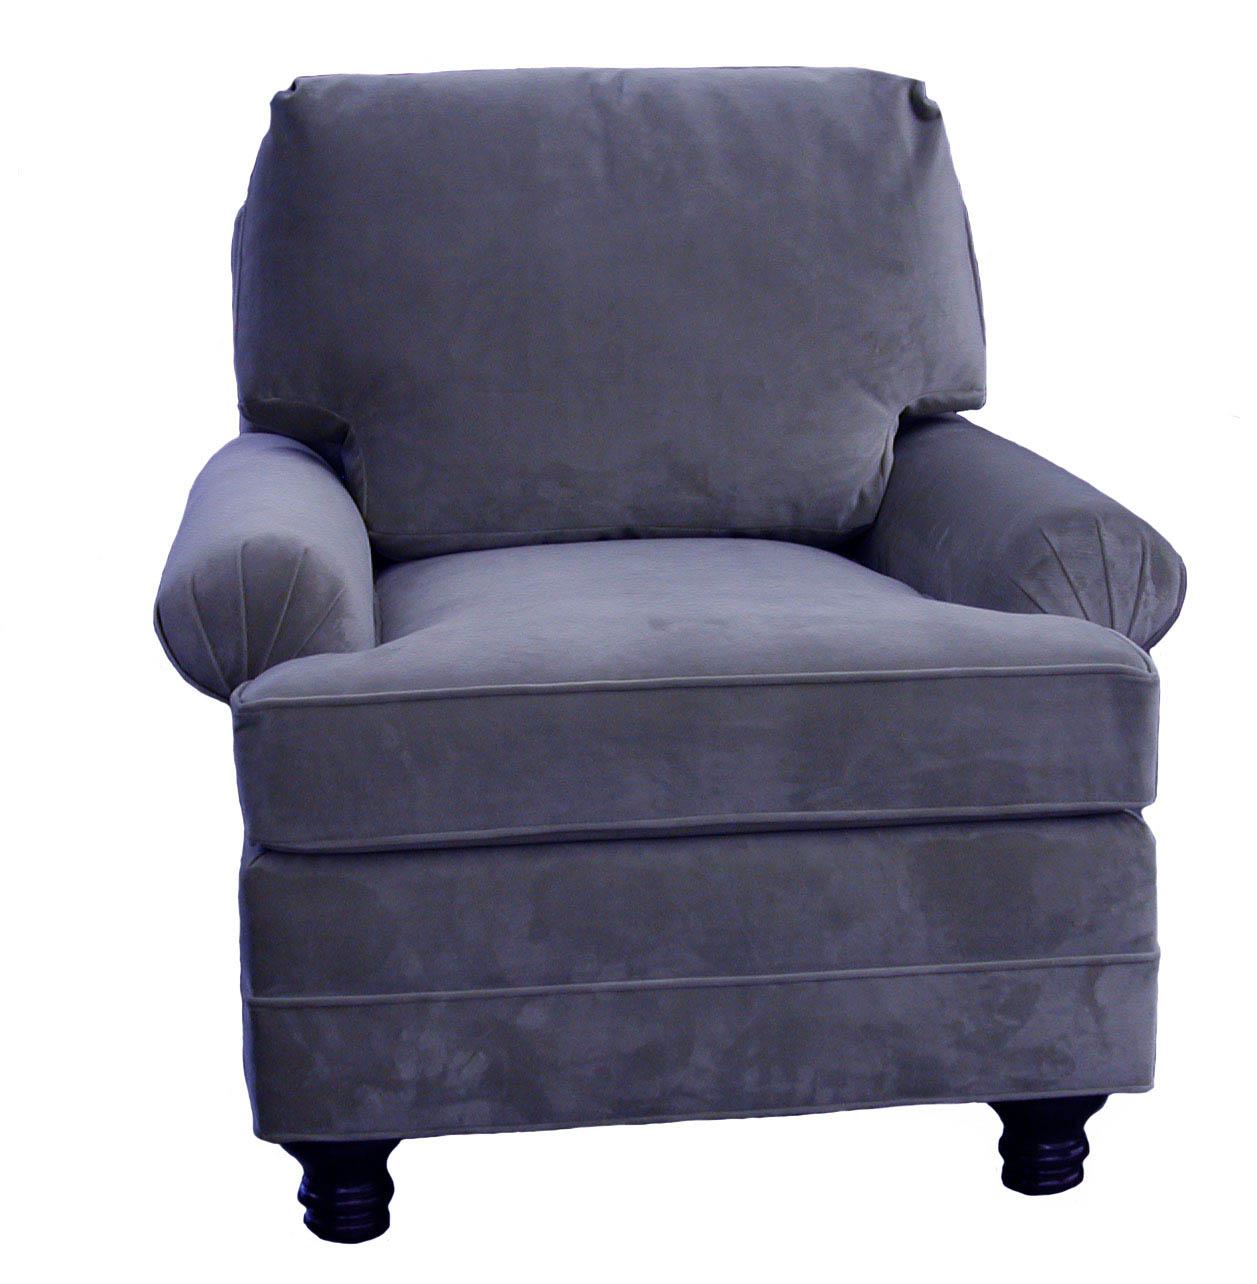 Brooke Chair Carolina Chair north carolina furniture